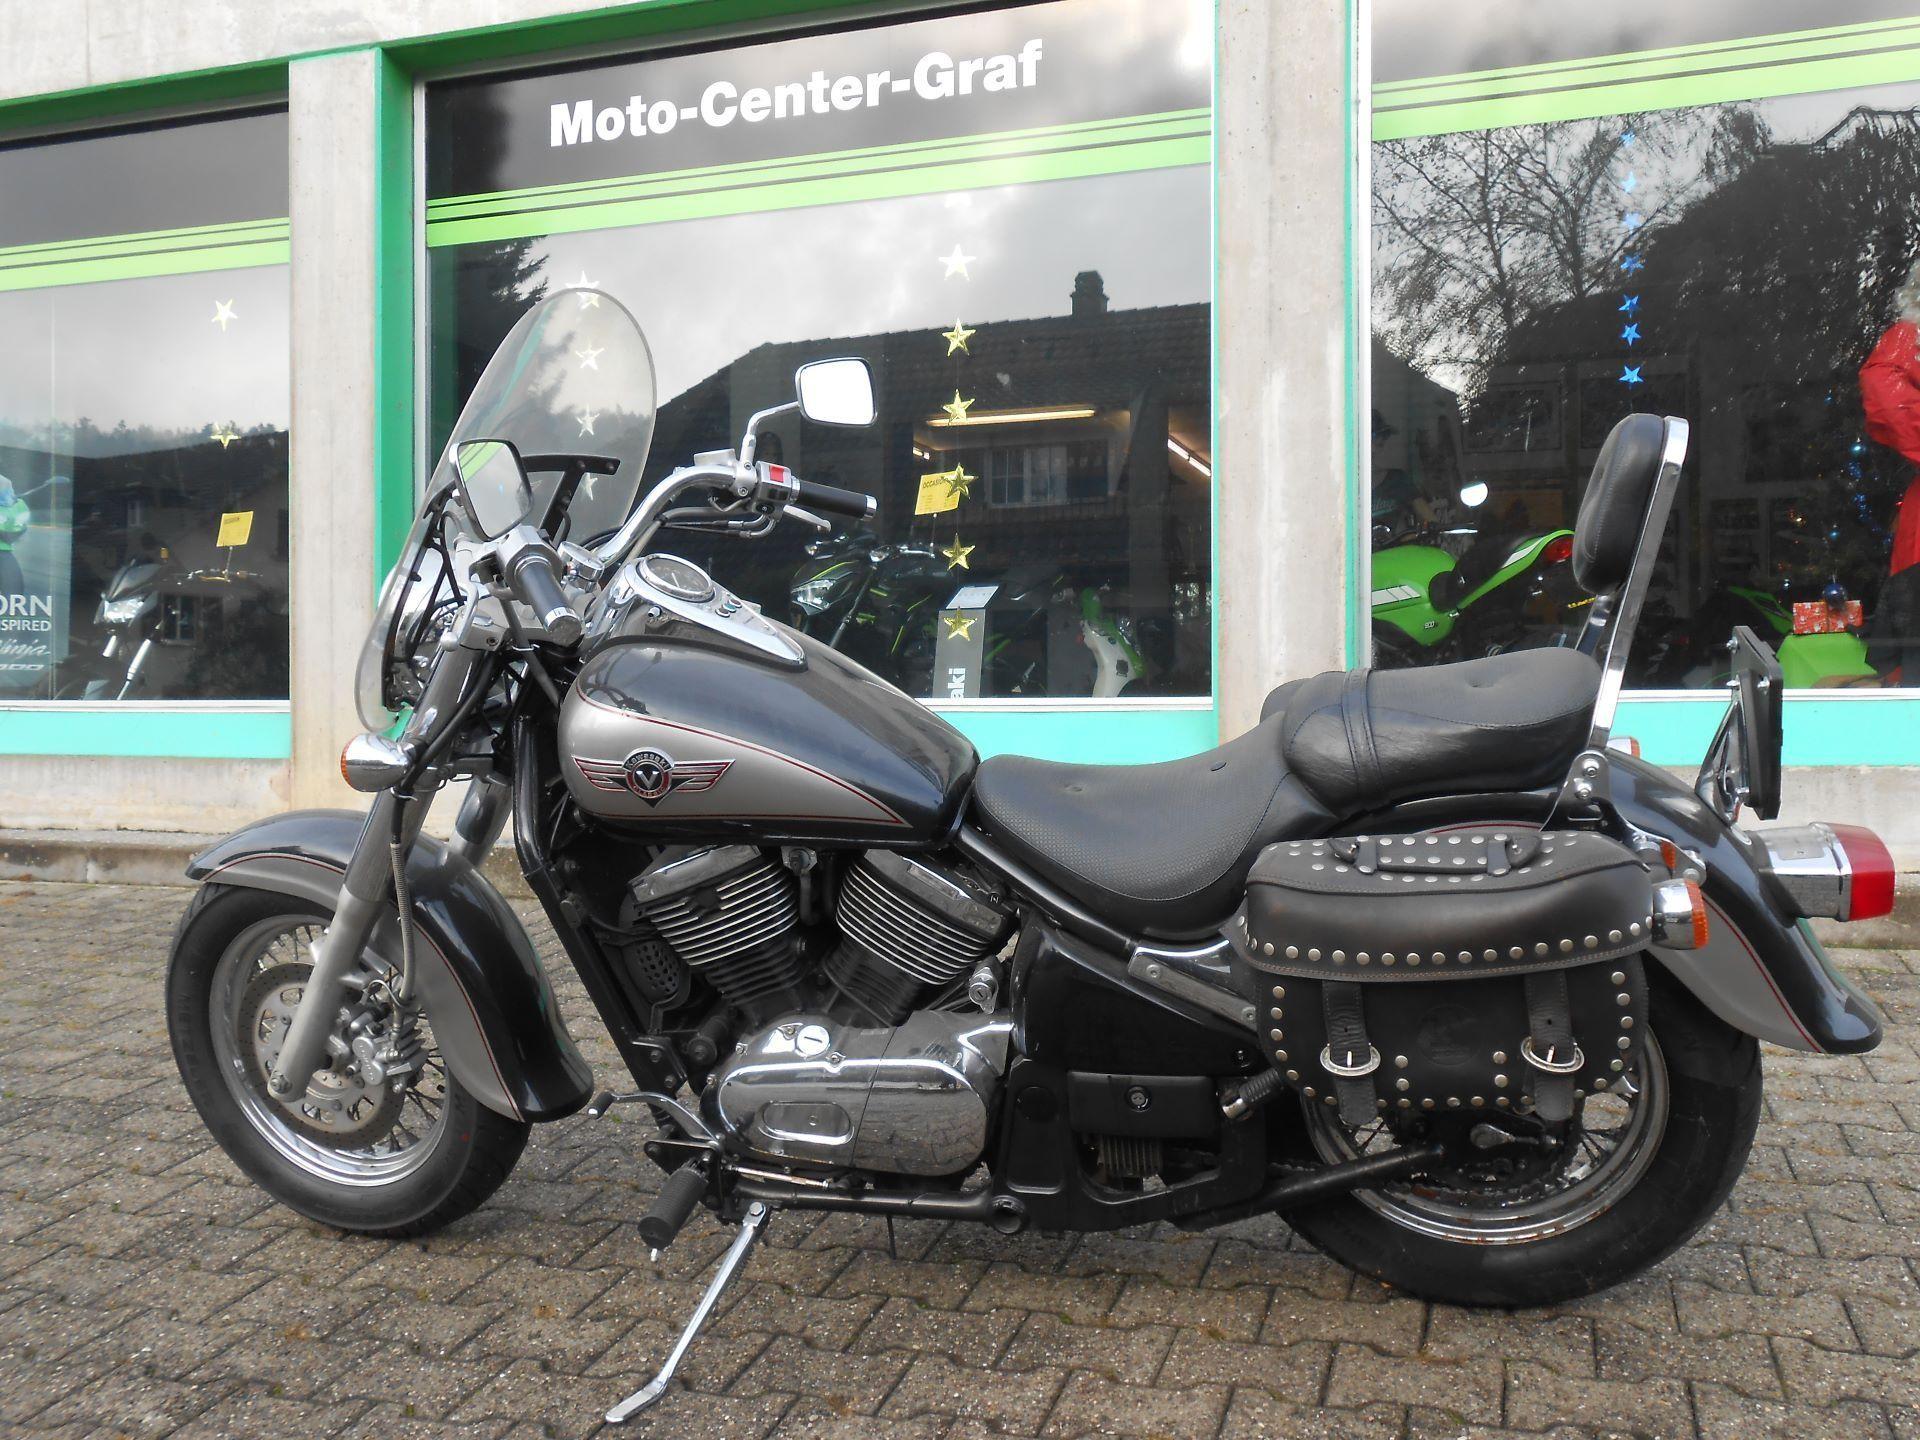 Buy Motorbike Pre Owned Kawasaki Vn 800 Classic Moto Center Graf